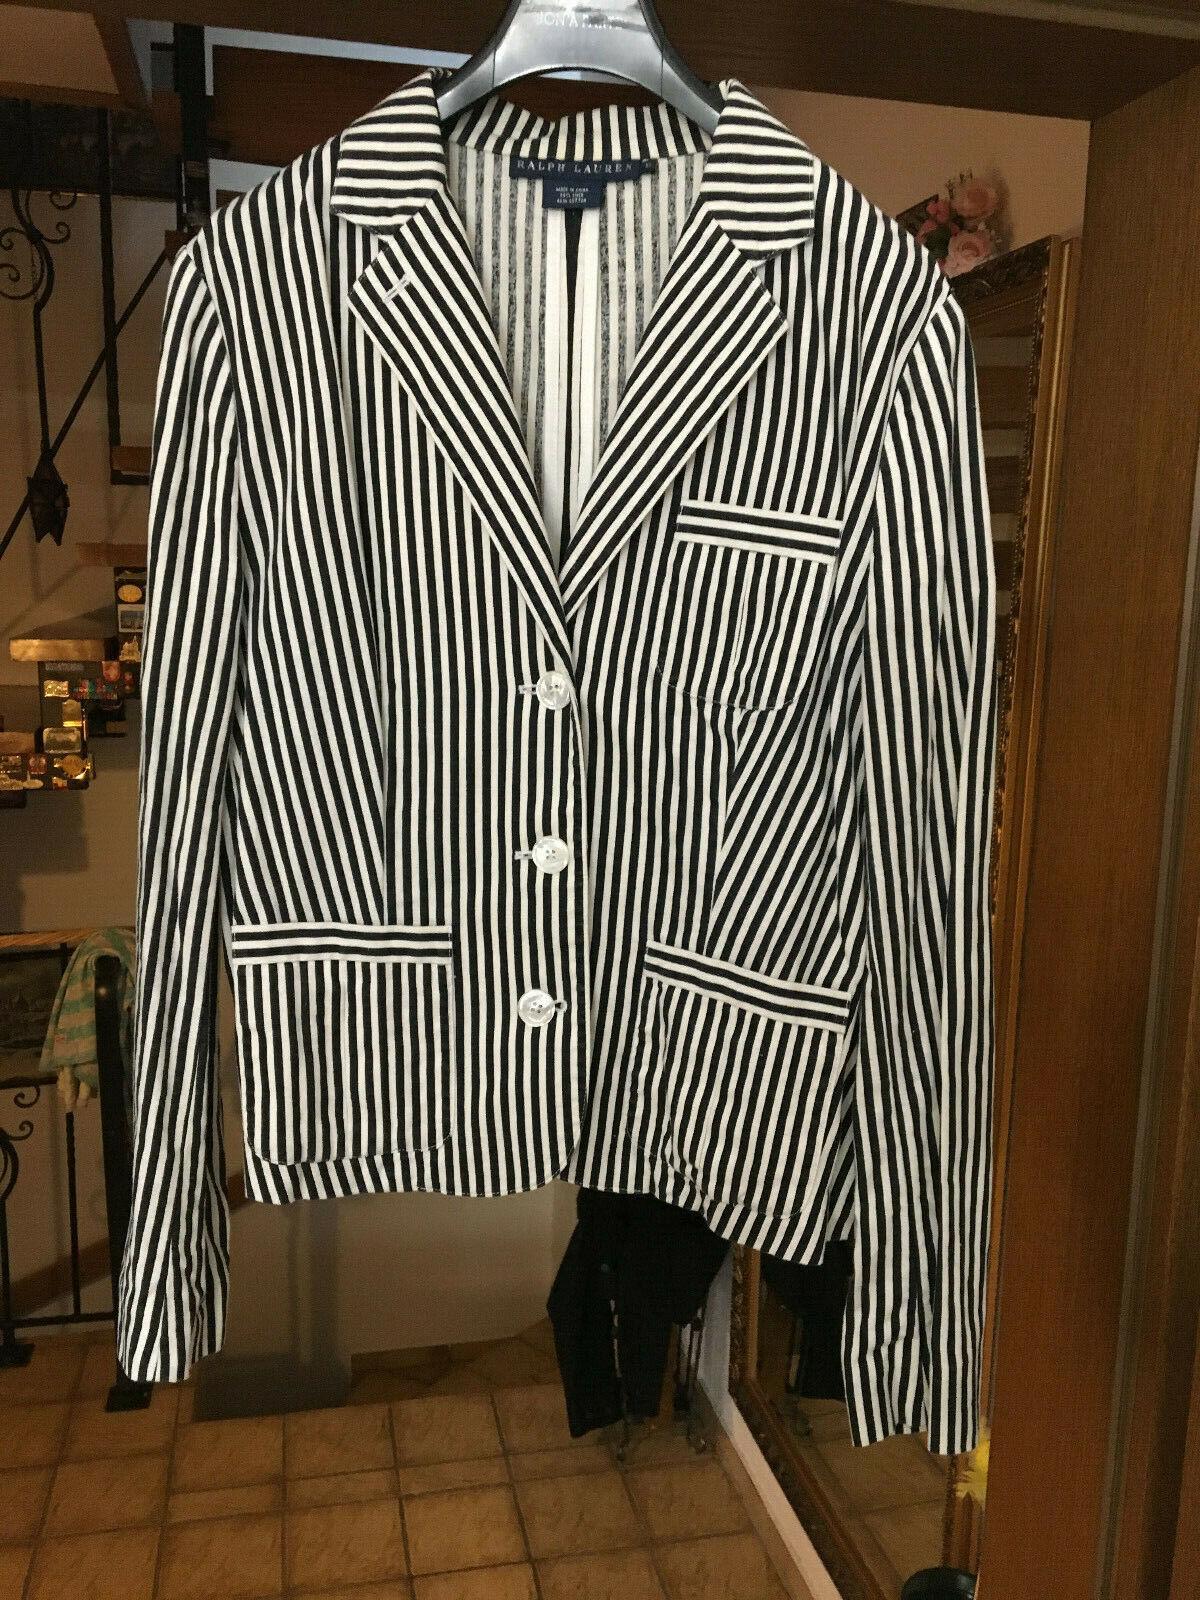 Damen Jacket  RAPH LAUREN  Gr.10 M,Gebraucht